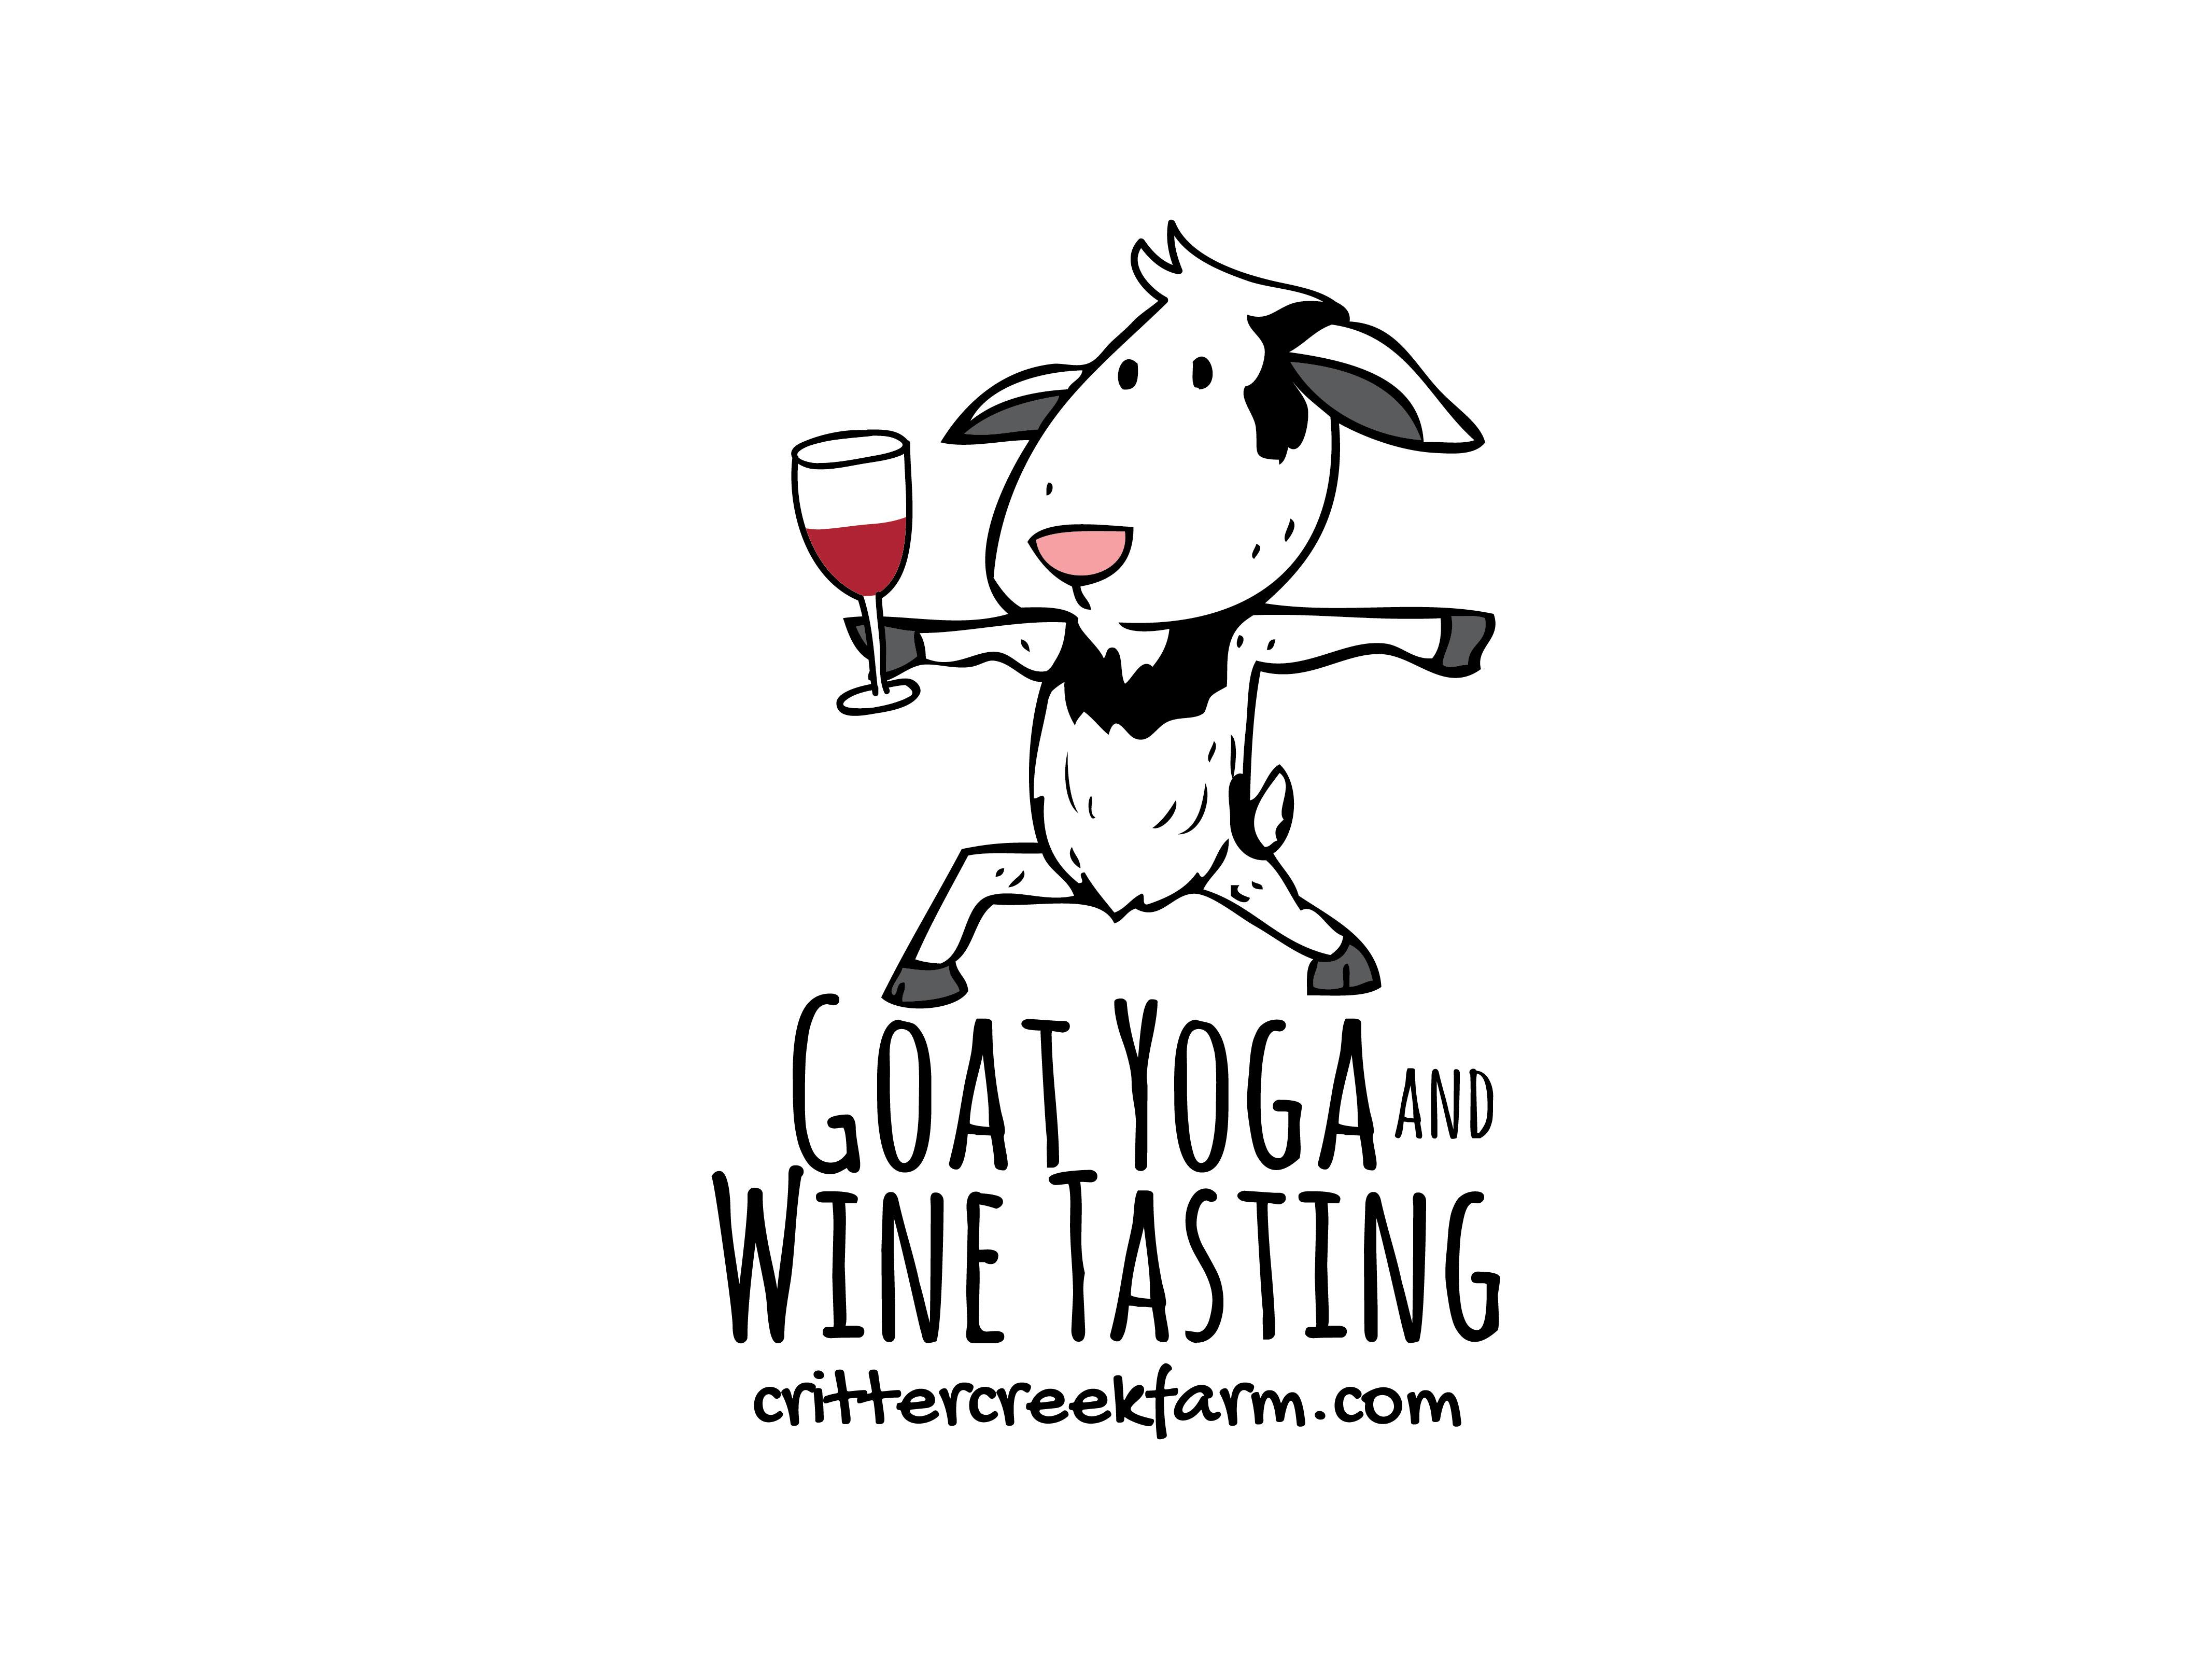 Goat Yoga and Wine Tasting